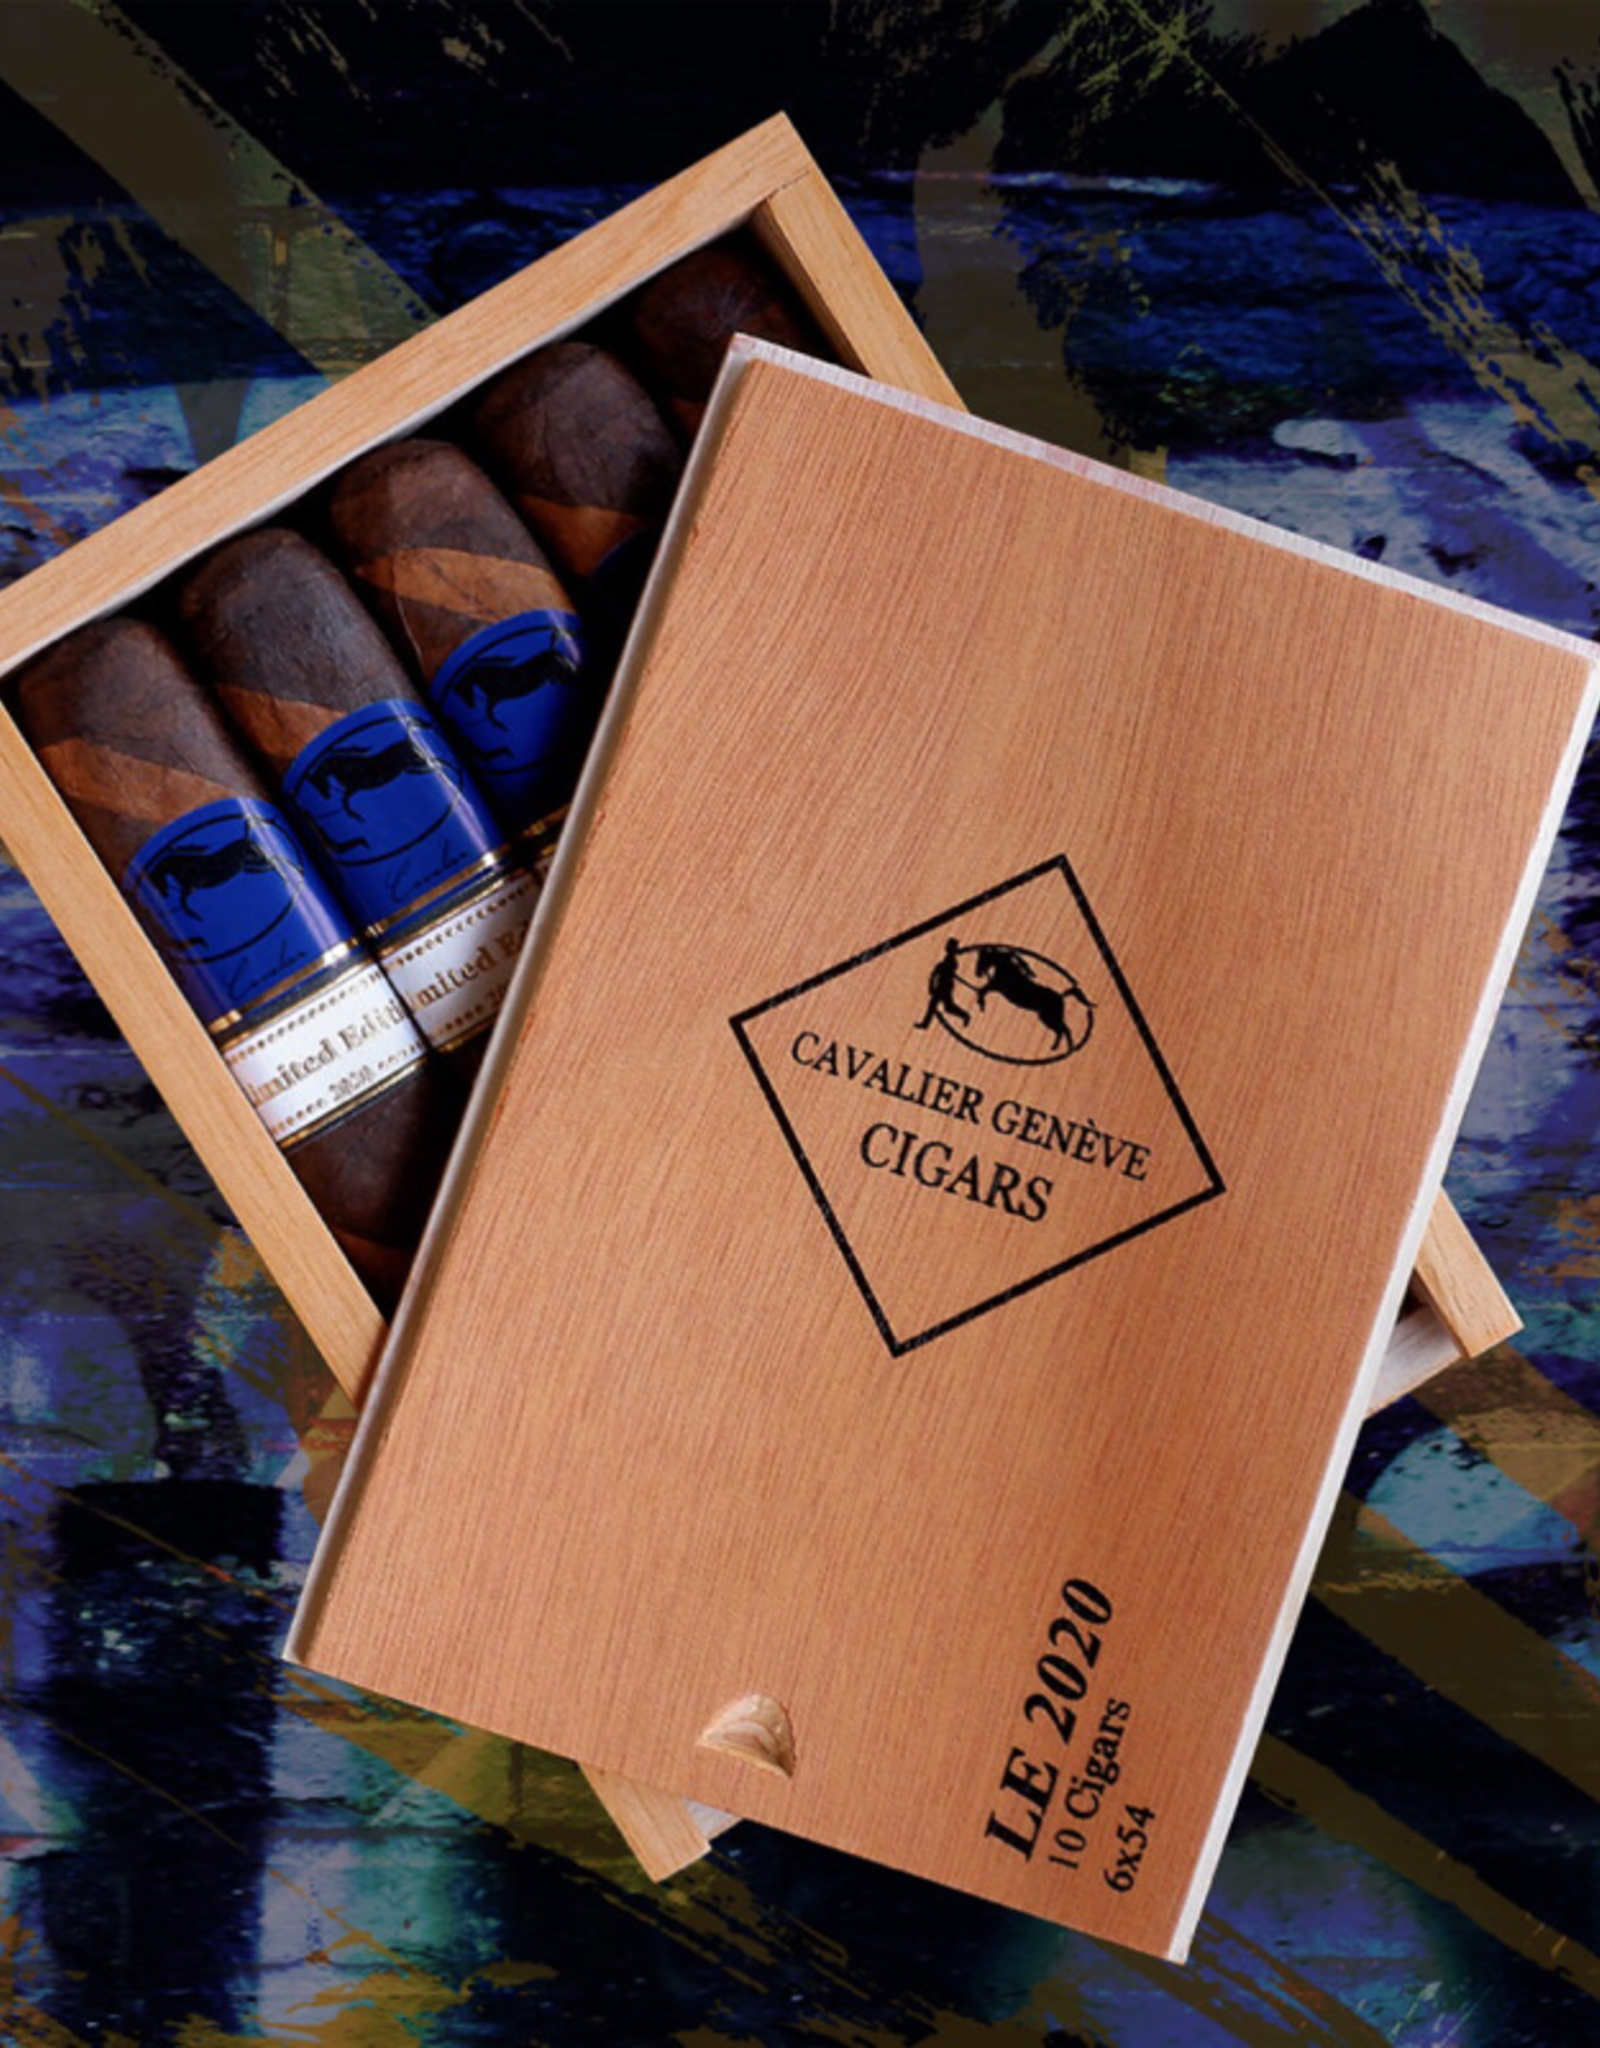 Cavalier Geneve Cavalier Geneve Blue Series Limited Edition 2020 Box of 10